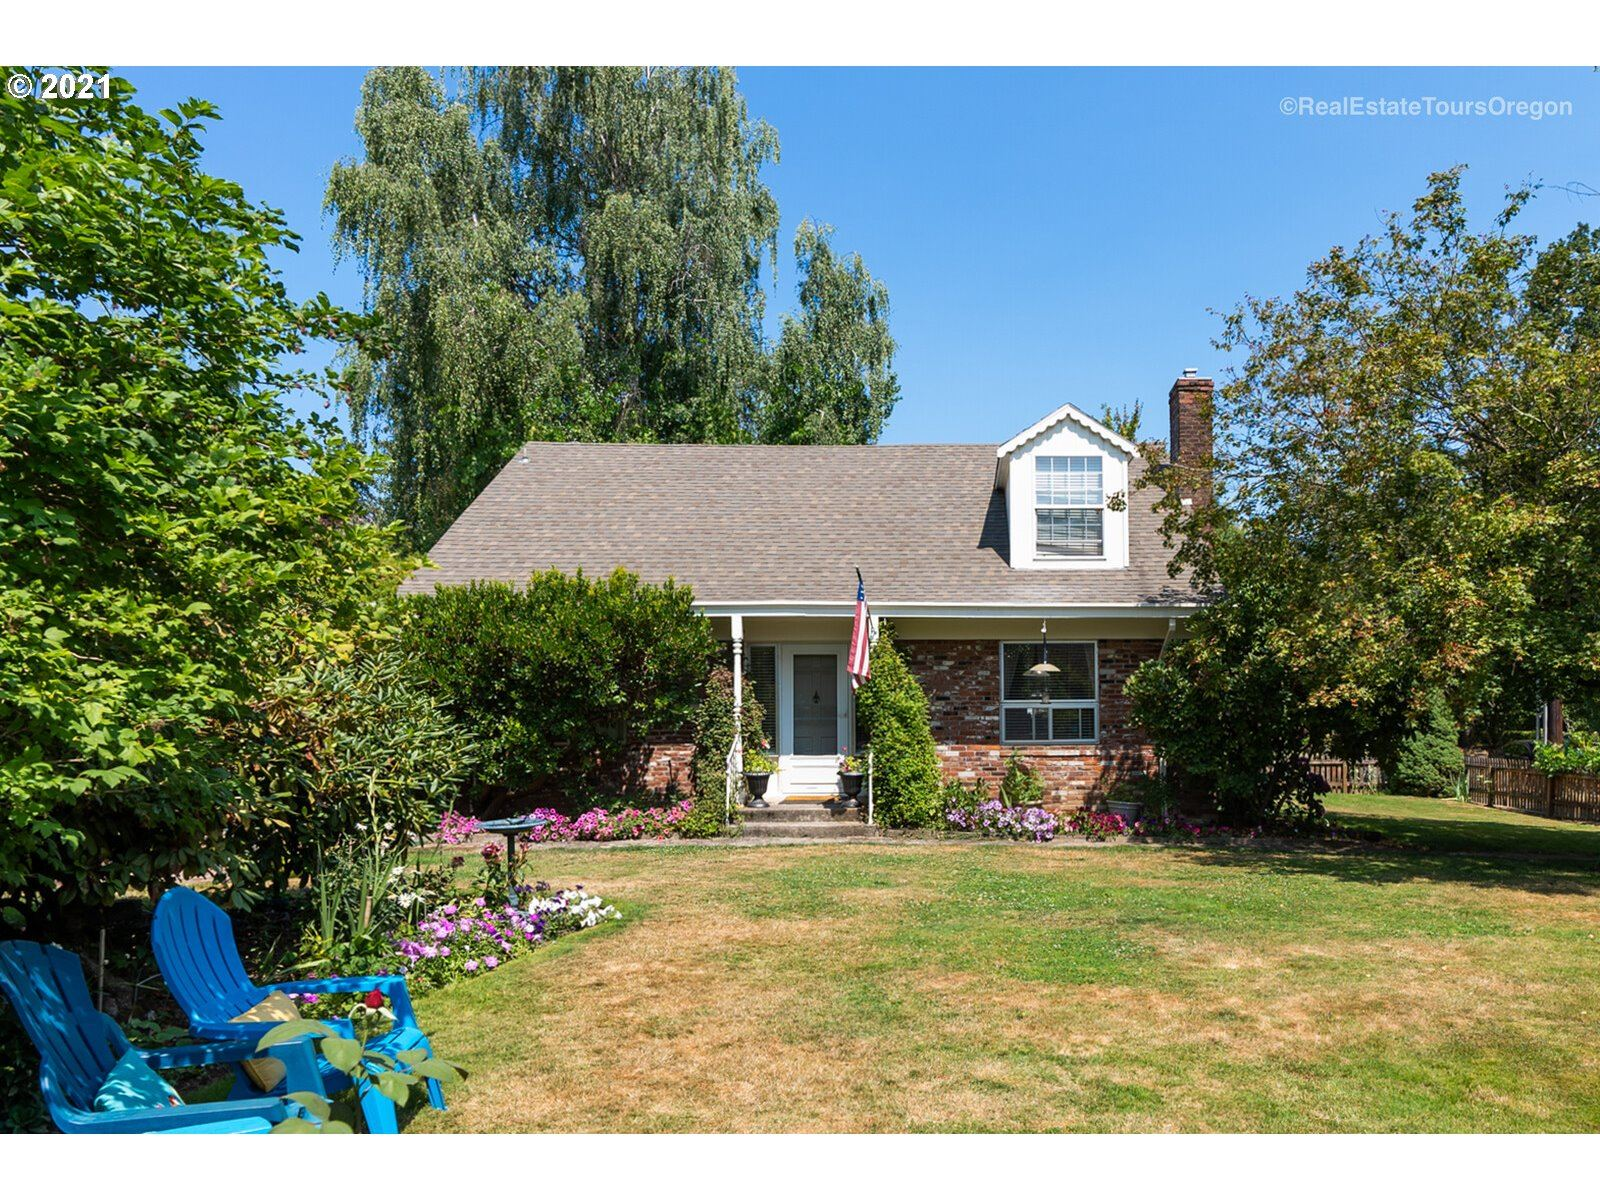 1626 CEDAR ST, Forest Grove, OR 97116 - MLS#: 21425289